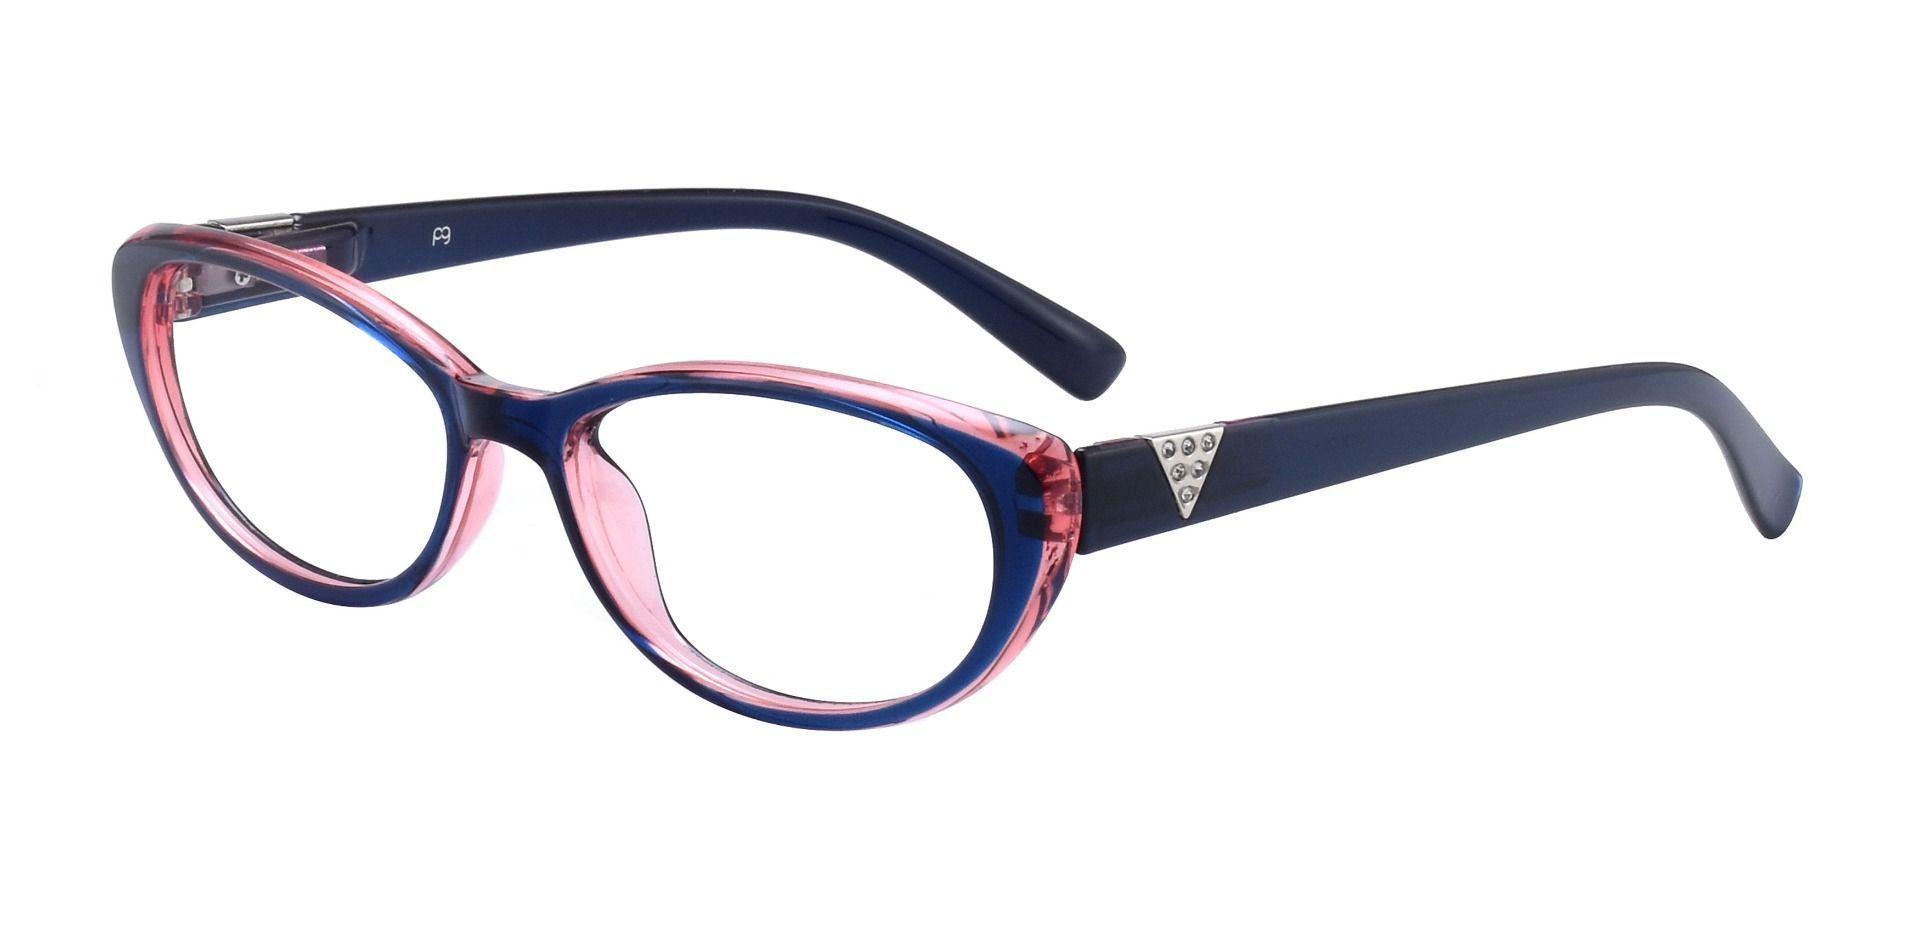 Iona Cat-Eye Prescription Glasses - Blue